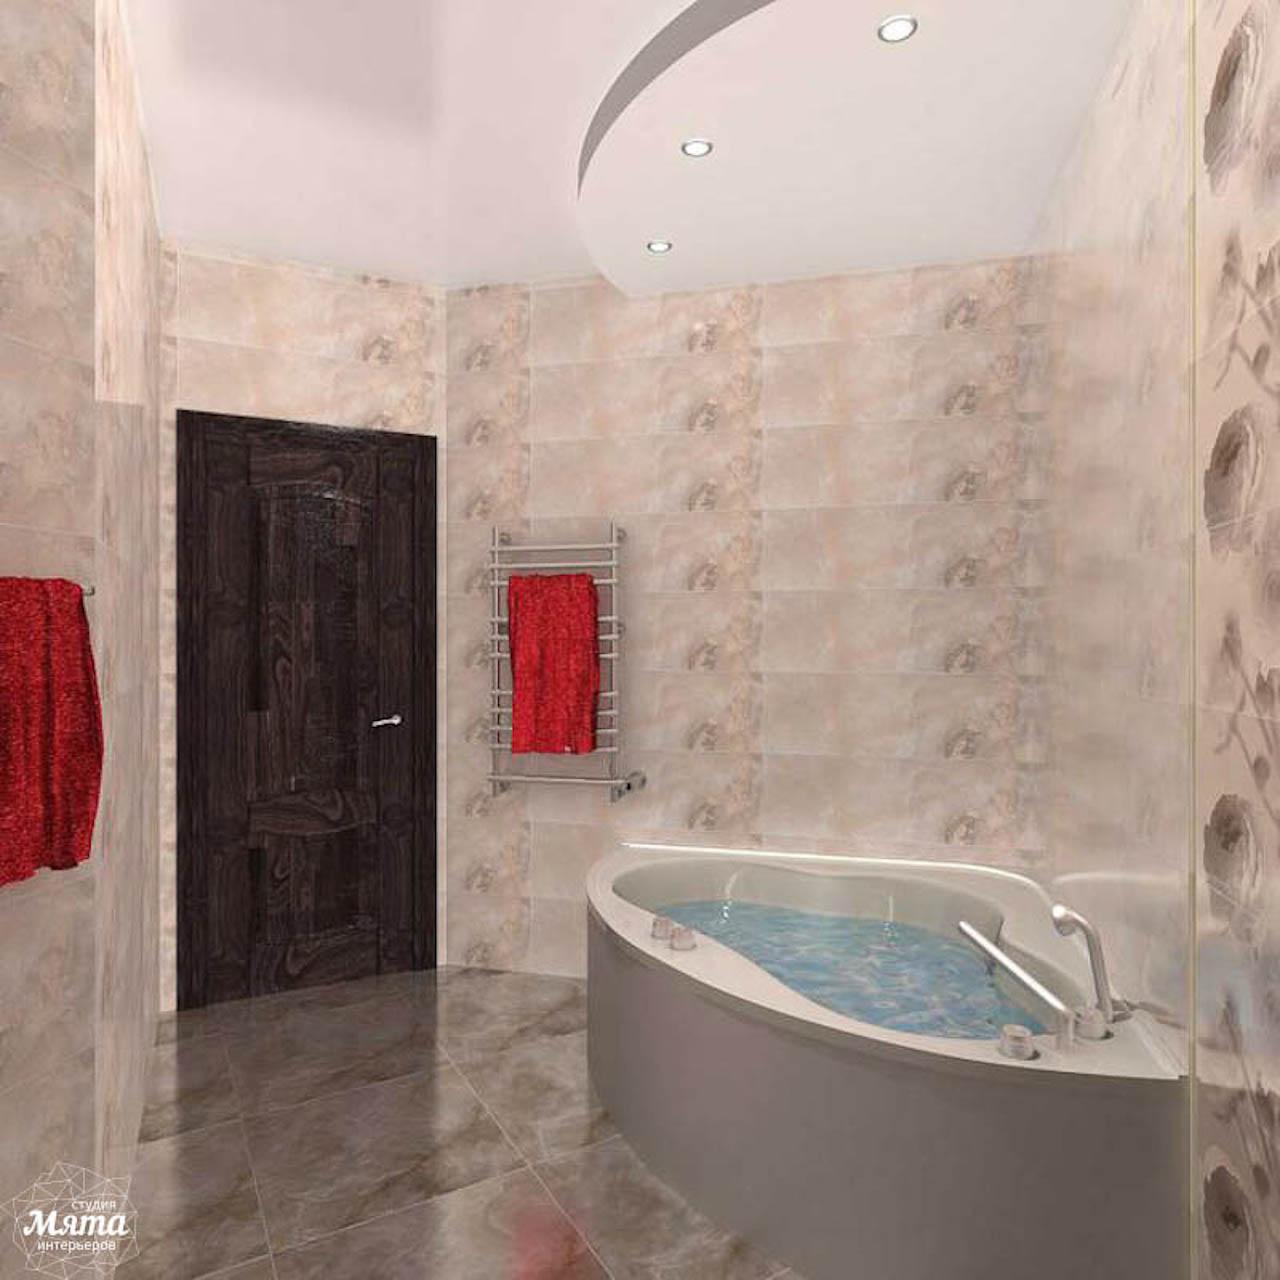 Дизайн интерьера двухкомнатной квартиры по ул. Юмашева 10 img1302270163